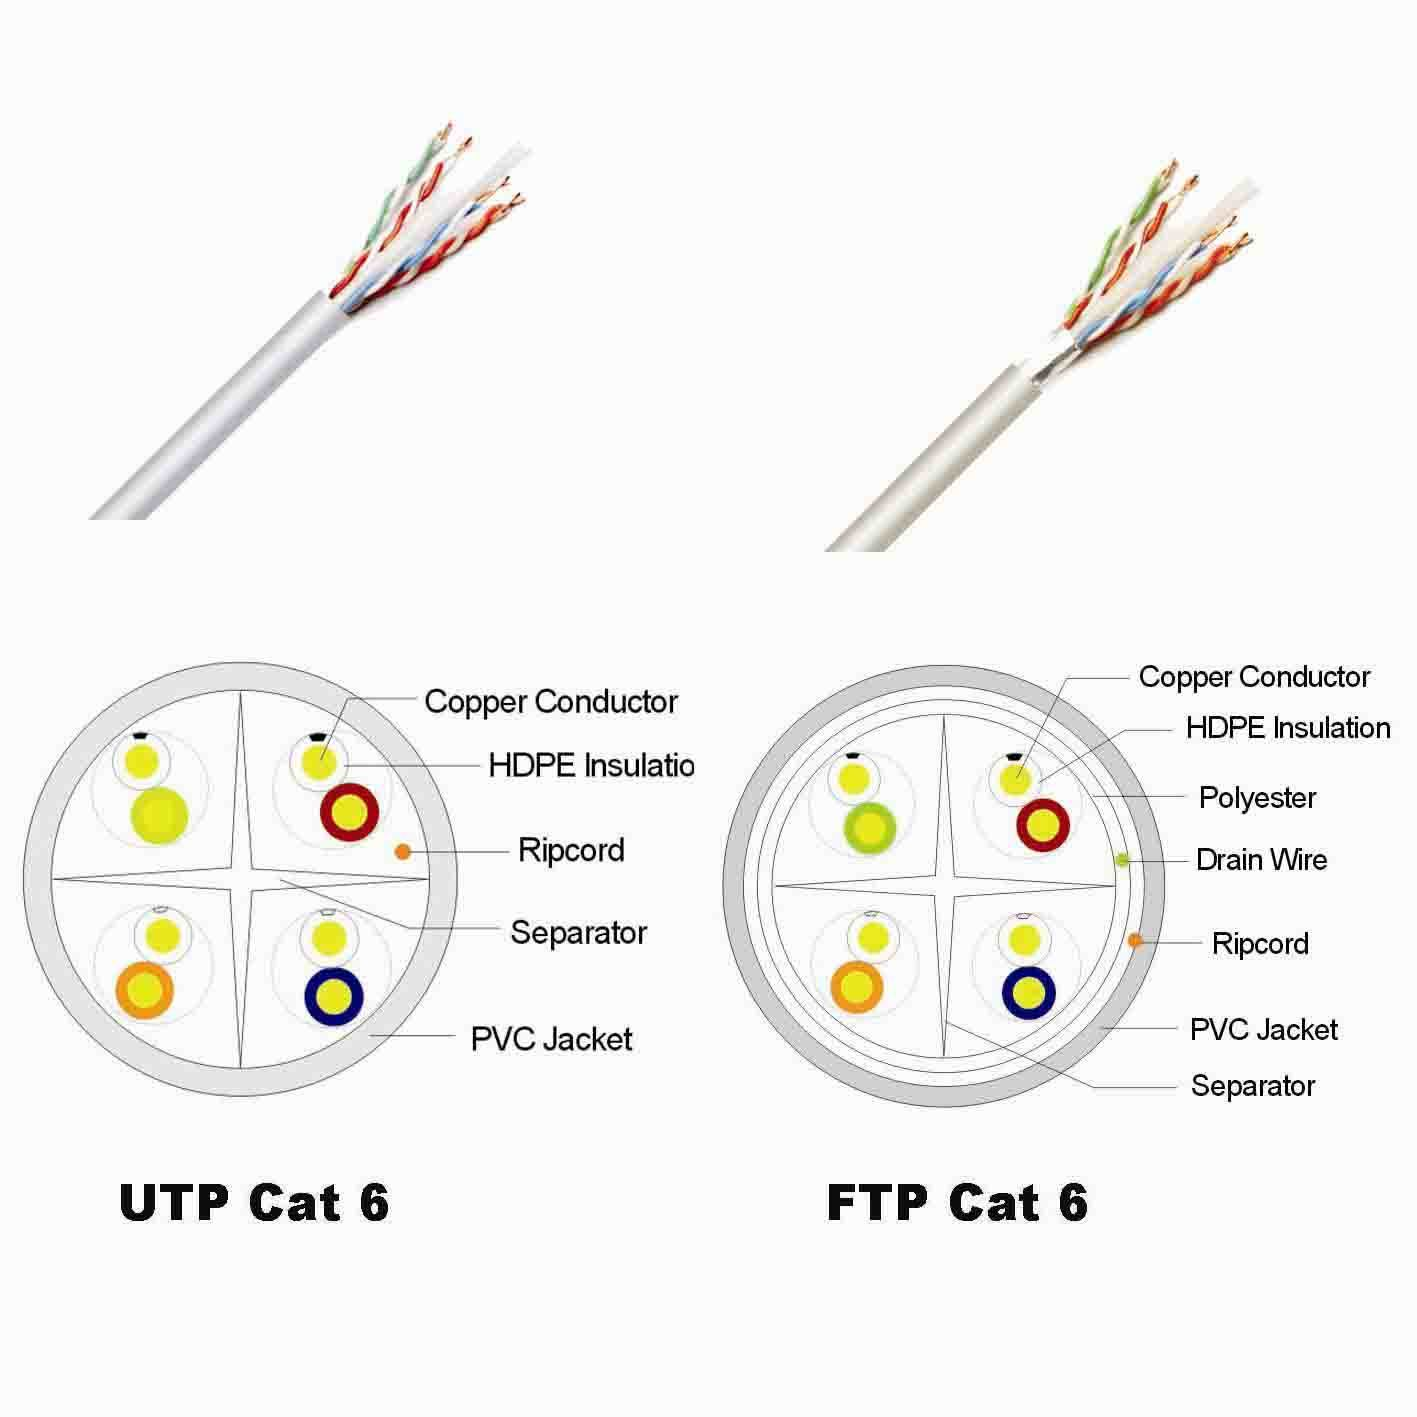 cat 5e vs 6 wiring diagram 2000 acura integra stereo china utp ftp lan cable